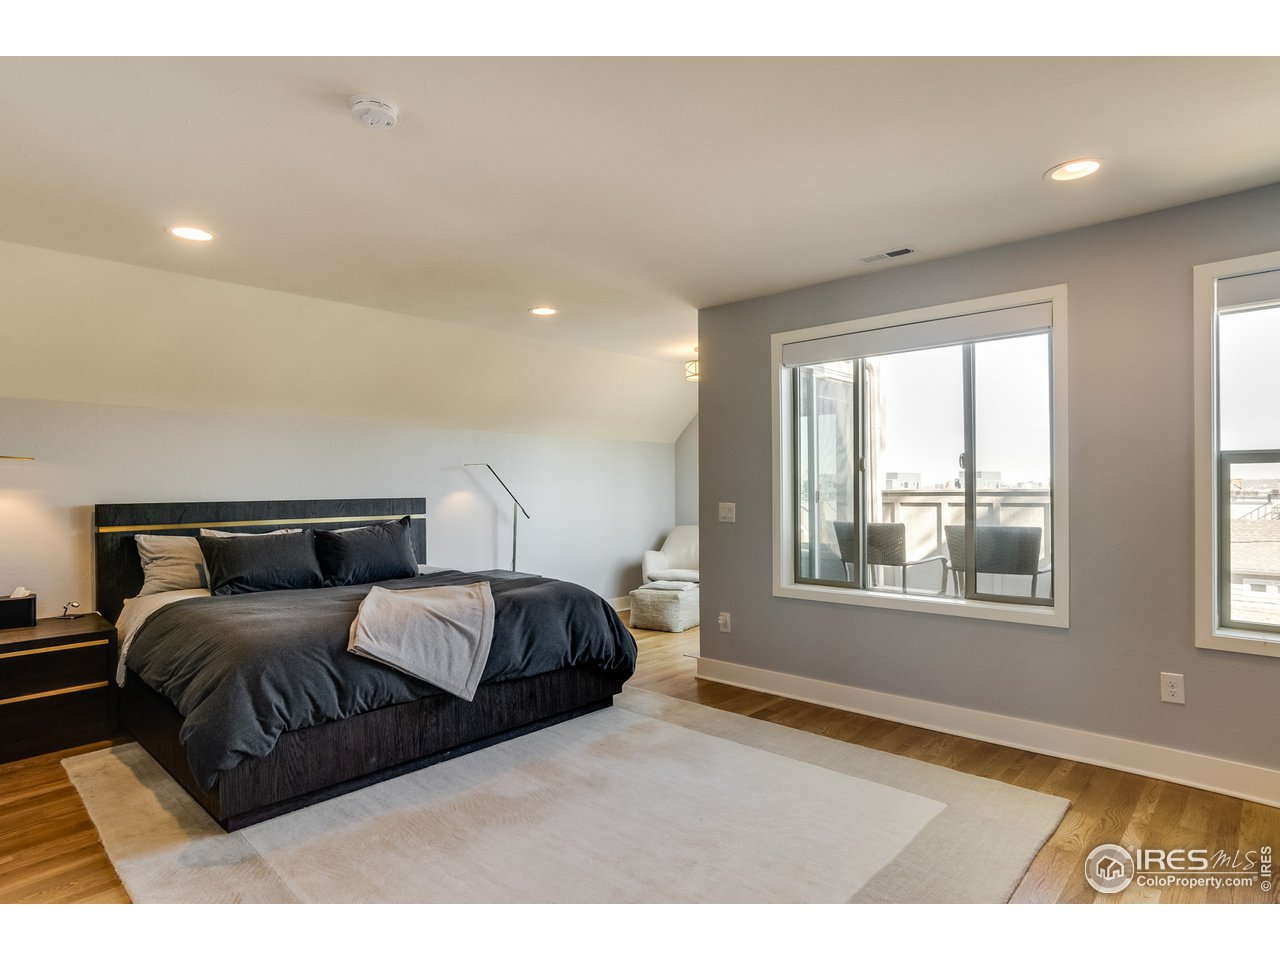 East Facing Master Bedroom Views